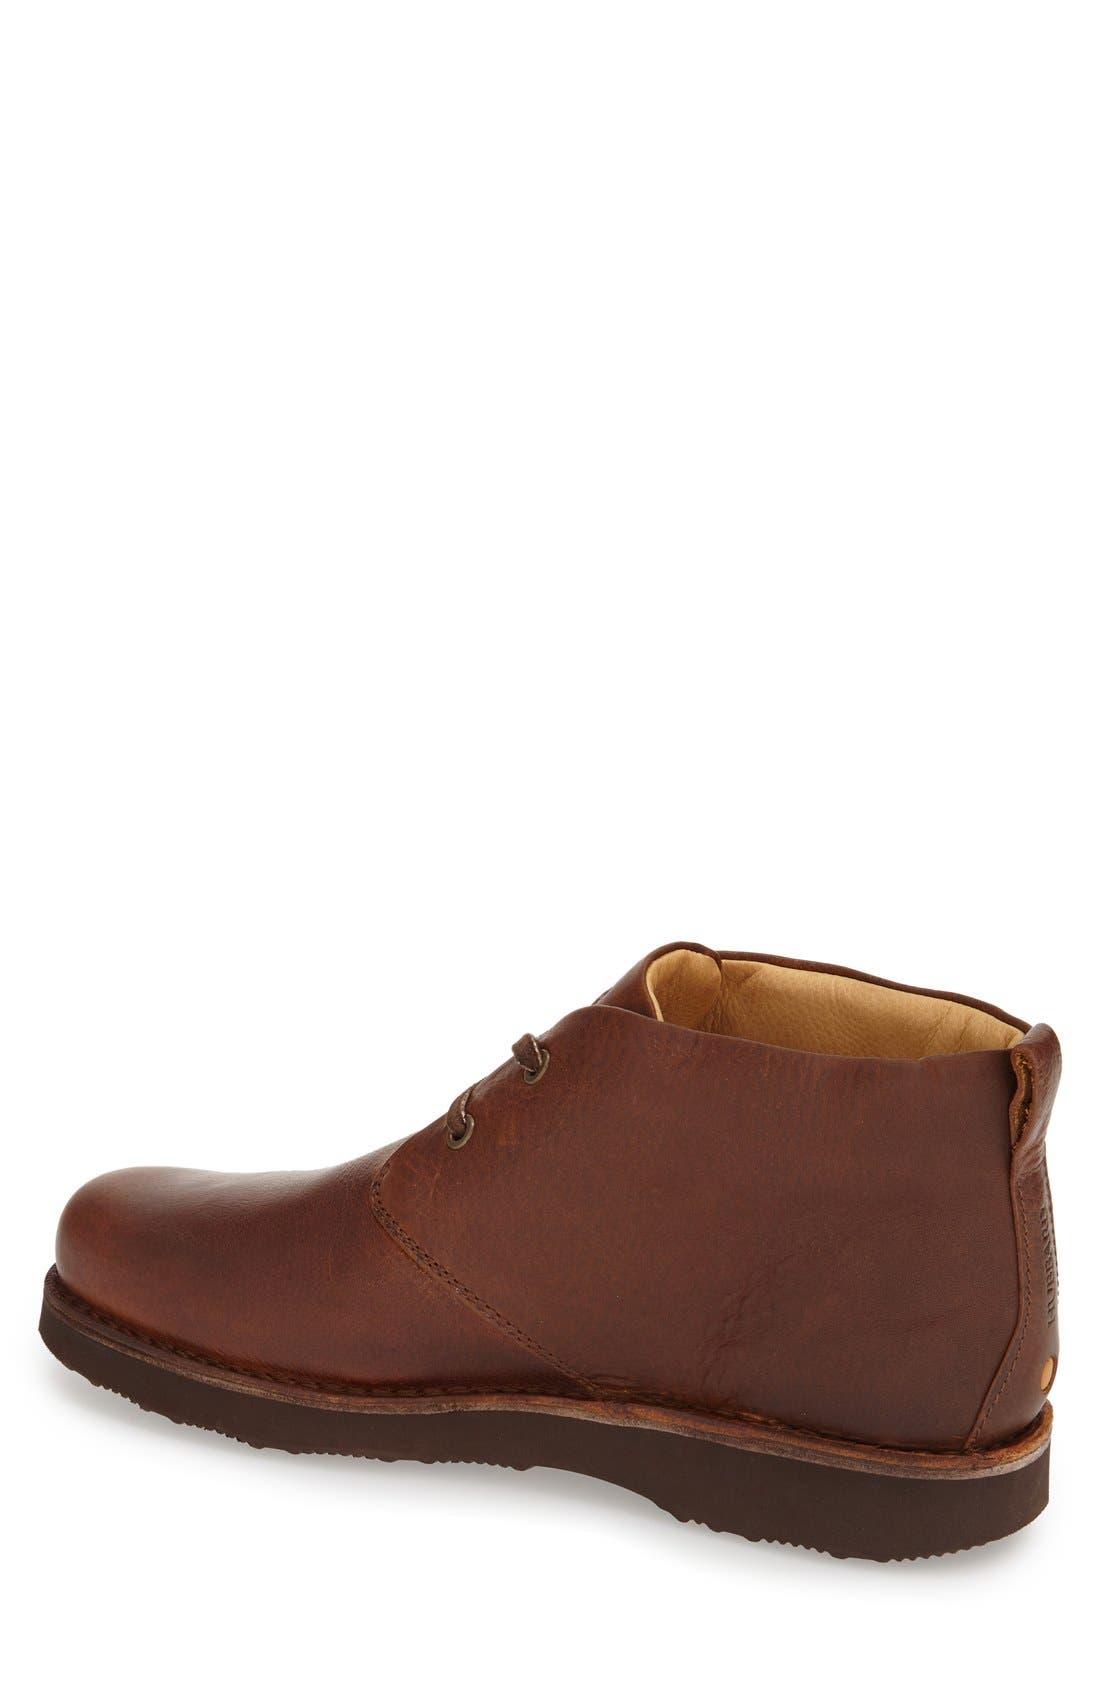 Alternate Image 2  - Samuel Hubbard 'Boot-Up' Chukka Boot (Men)